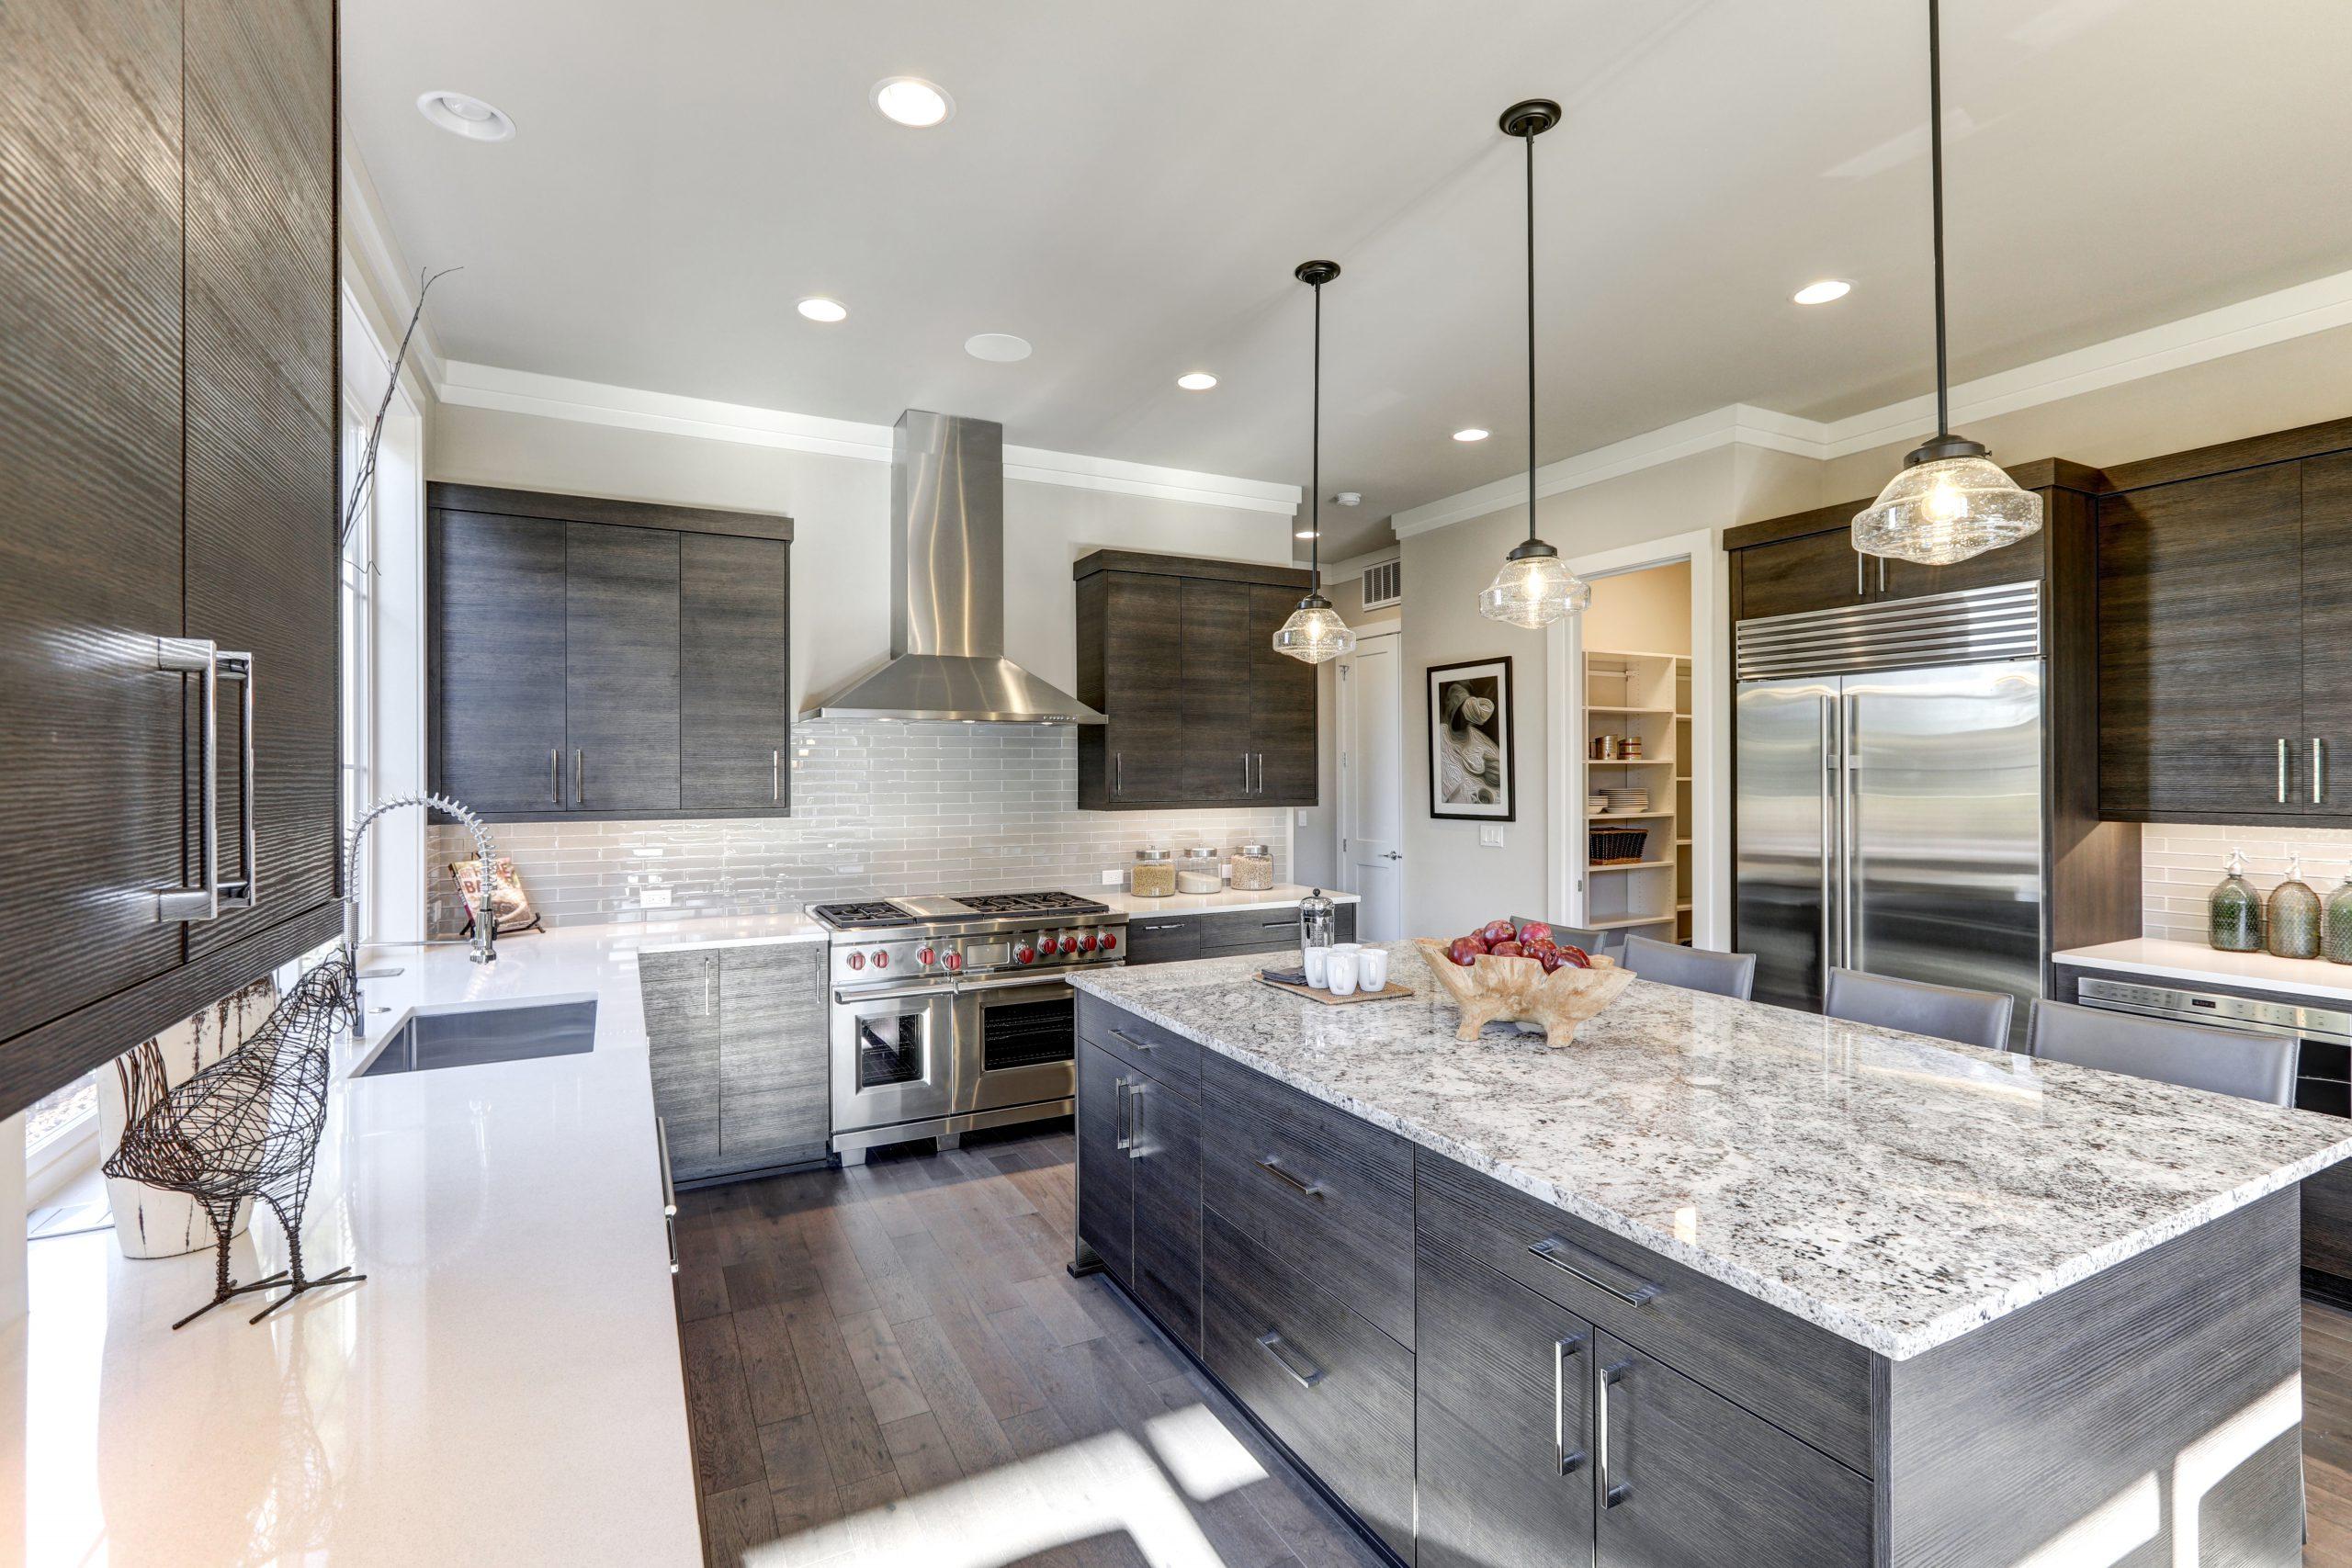 Modern-gray-kitchen-features-dark-gray-flat-front-cabinets